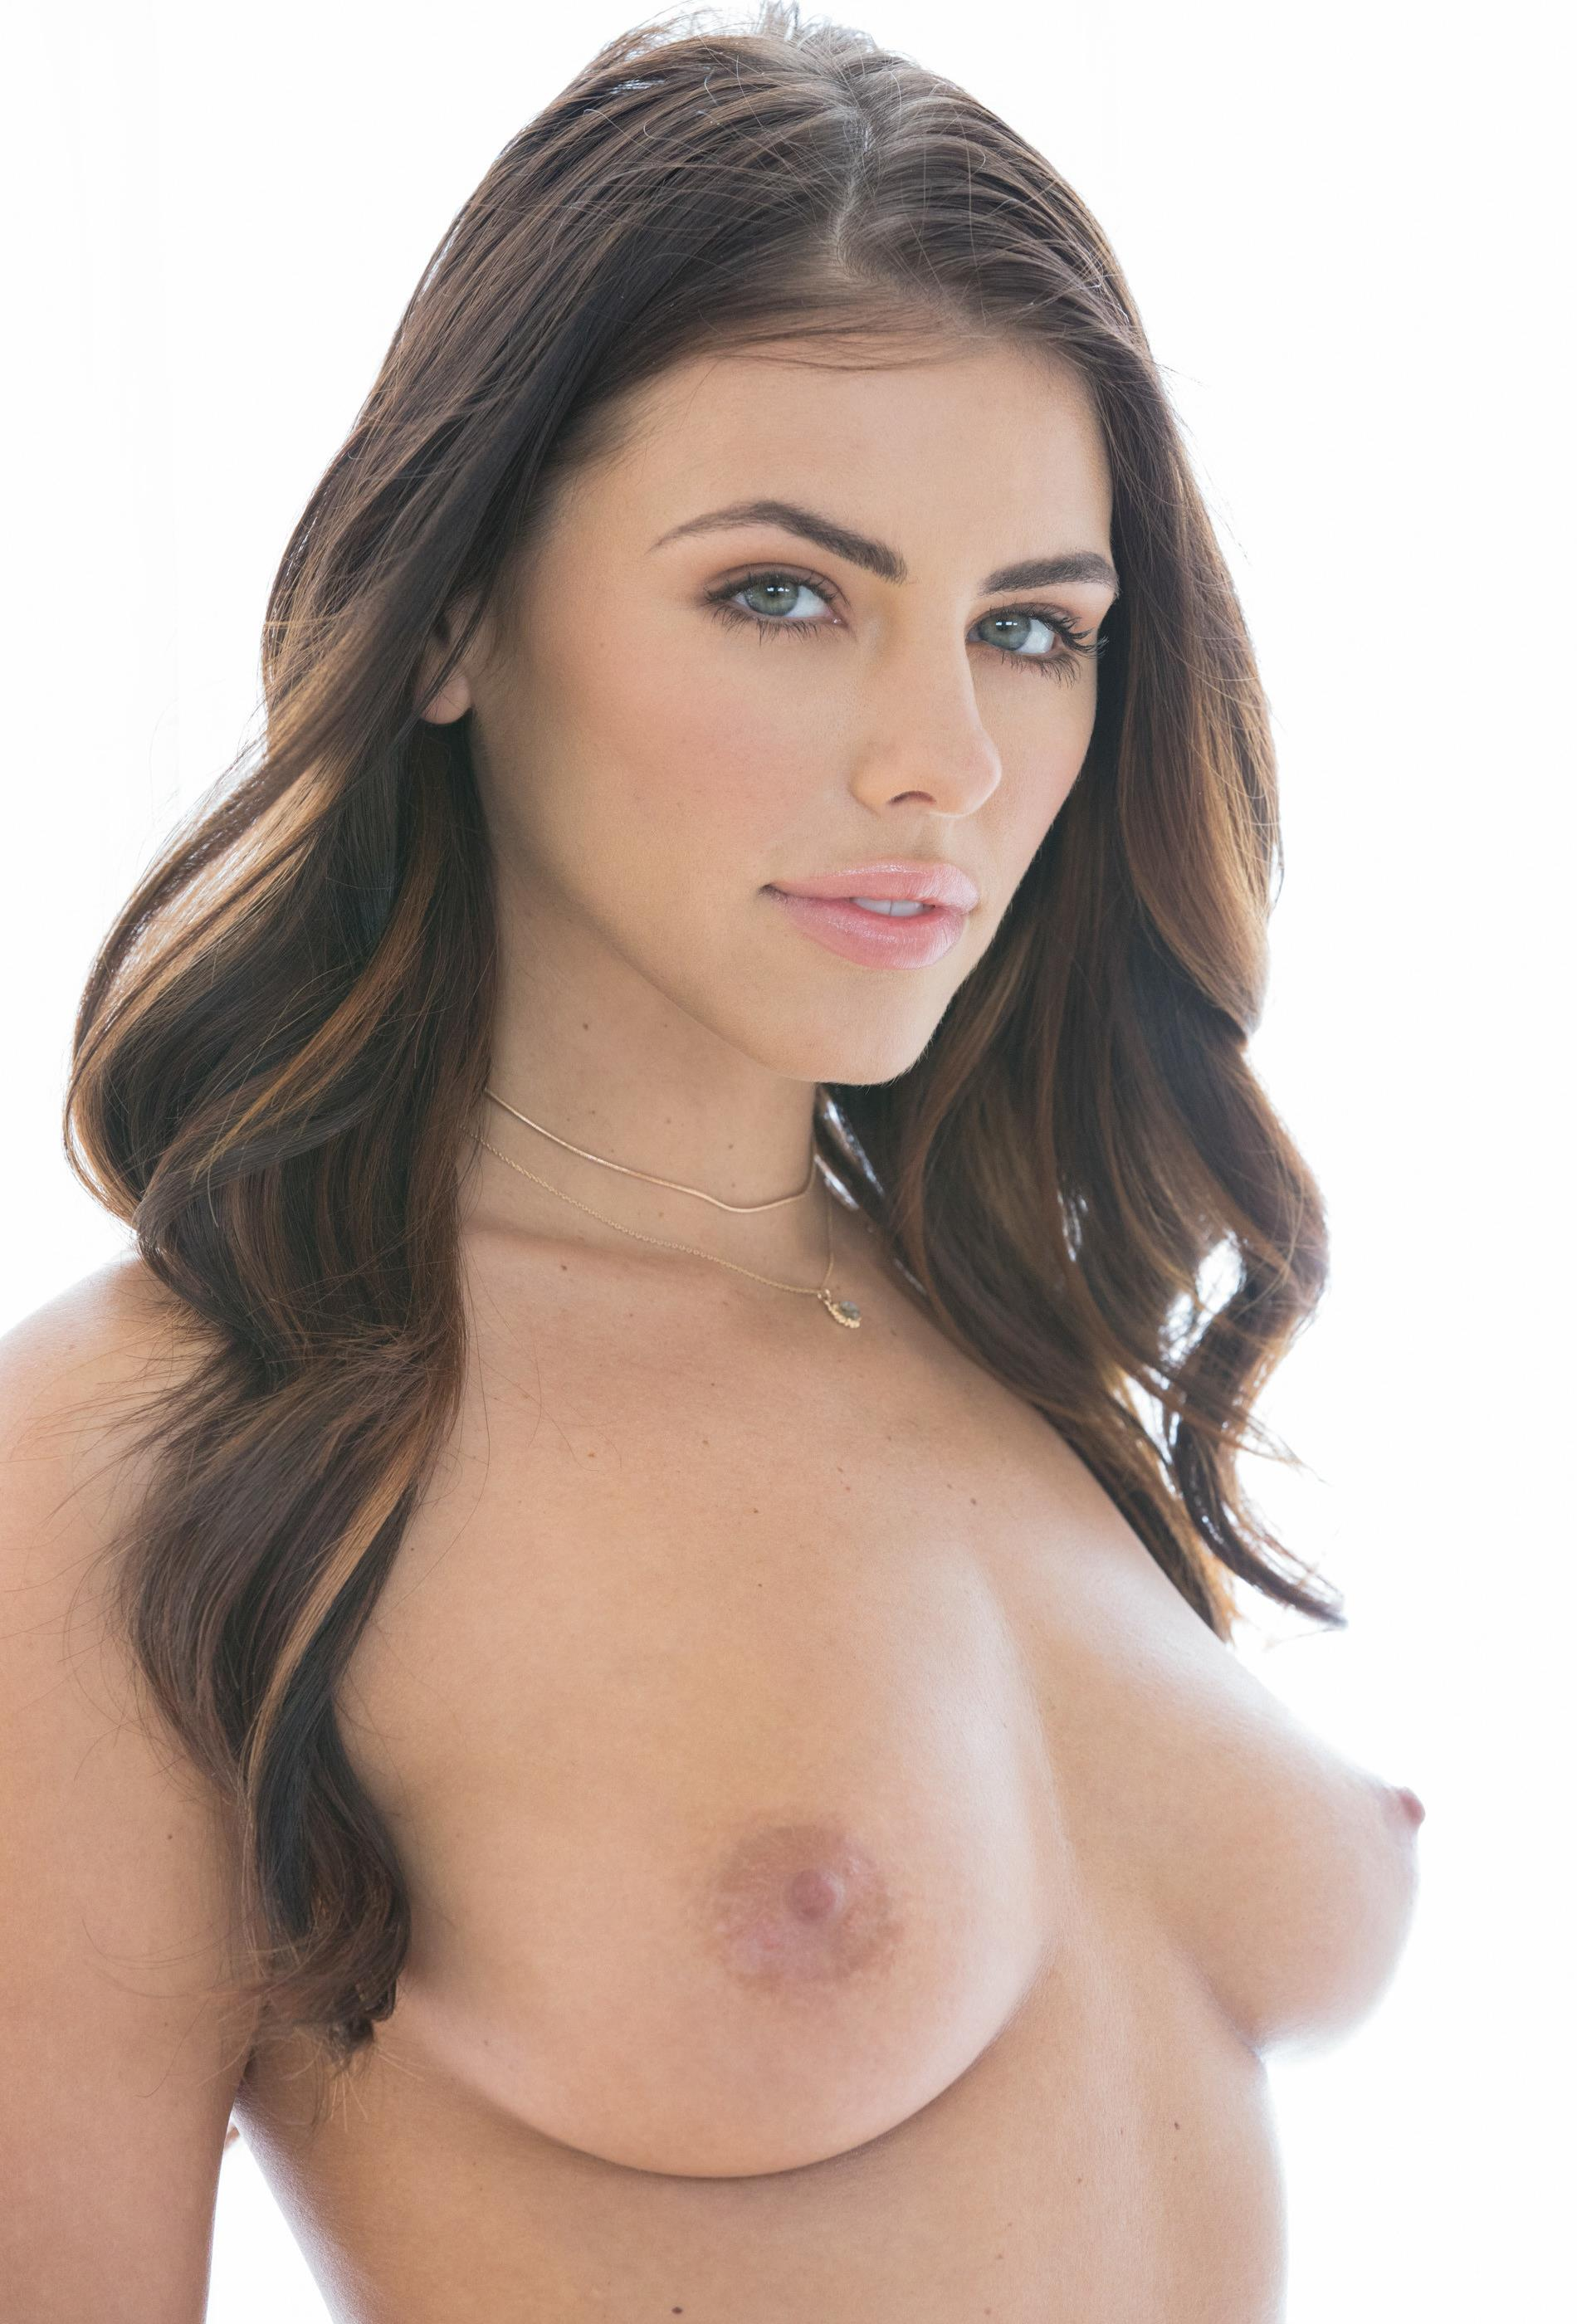 Adriana chechik nude pics